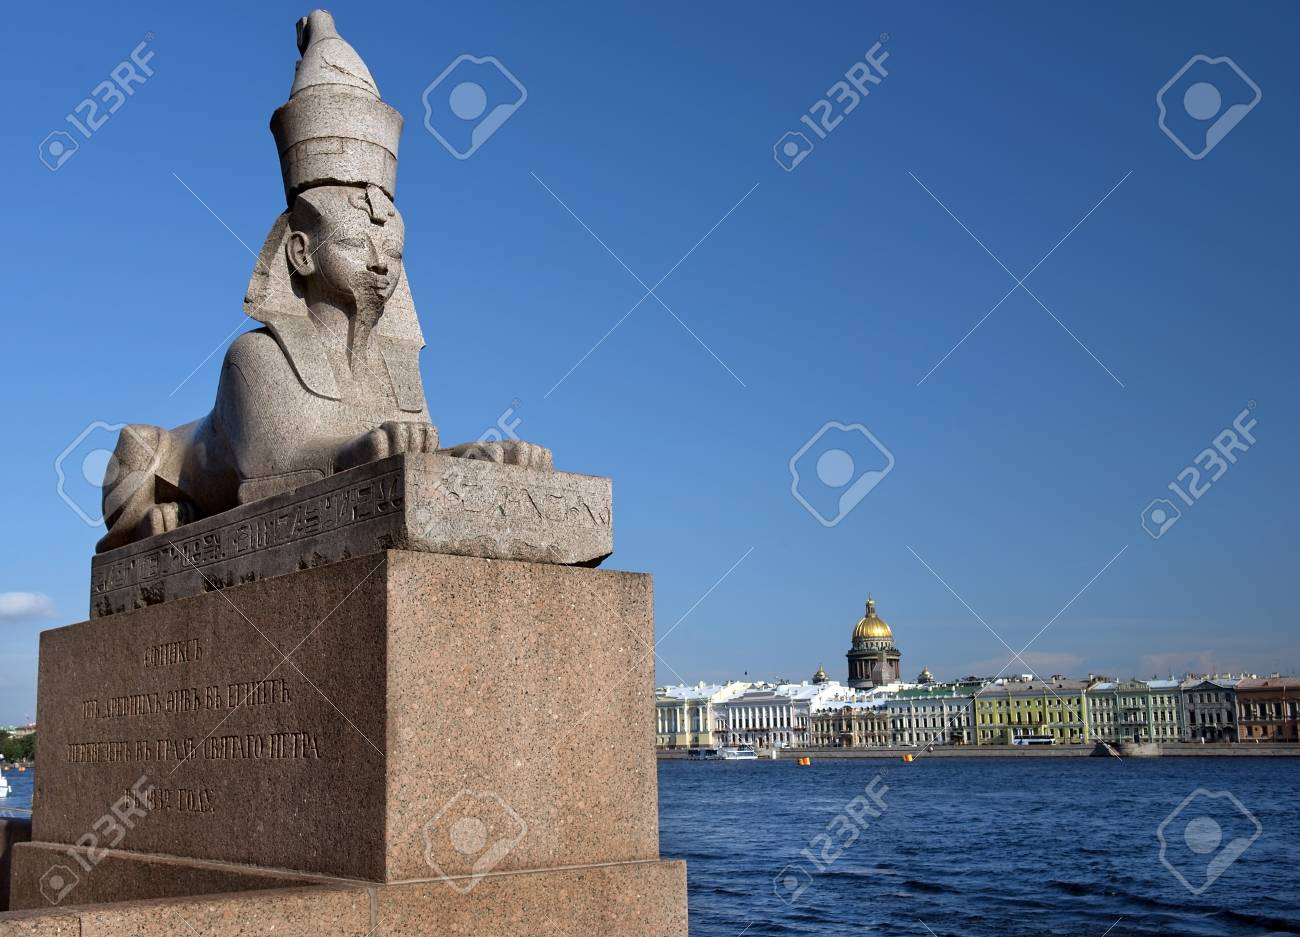 Sphinx in St. Petersburg: overview, description, history, location 59